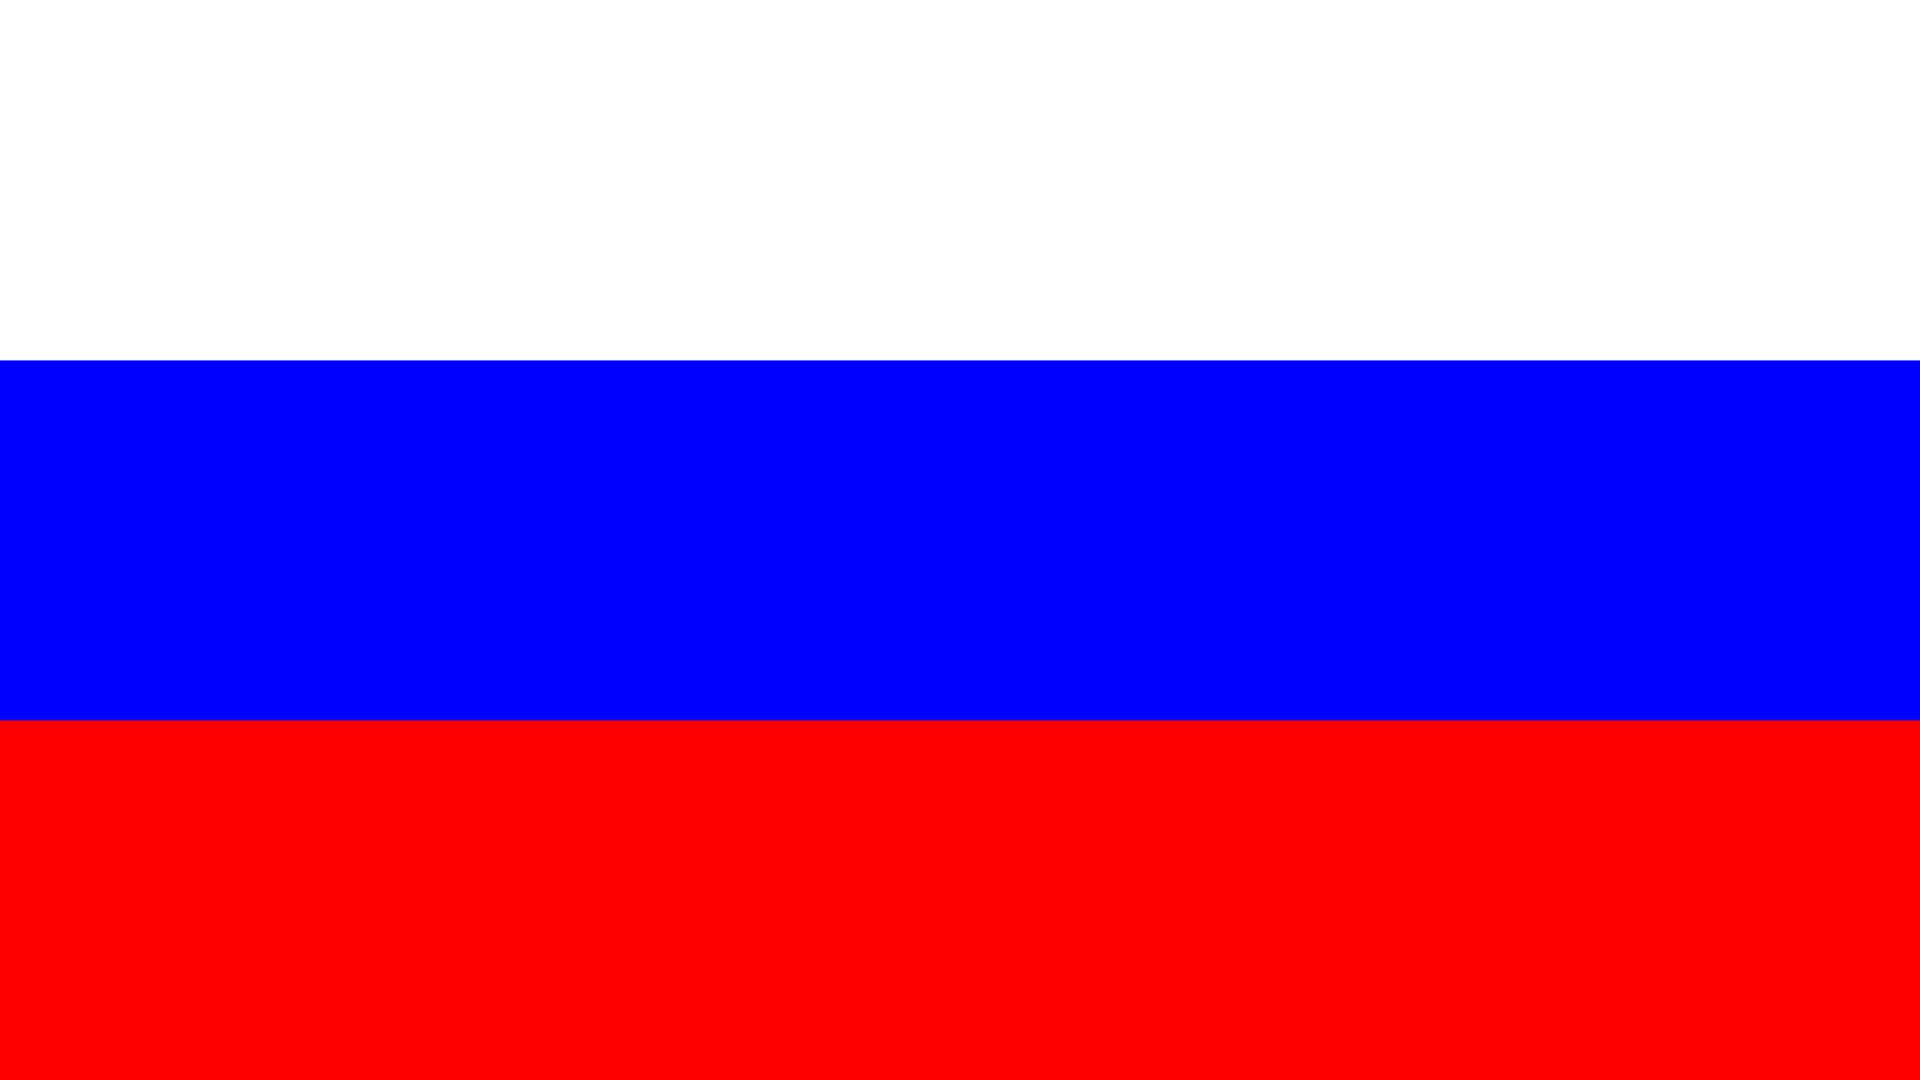 Флаг россии российский флаг флаг